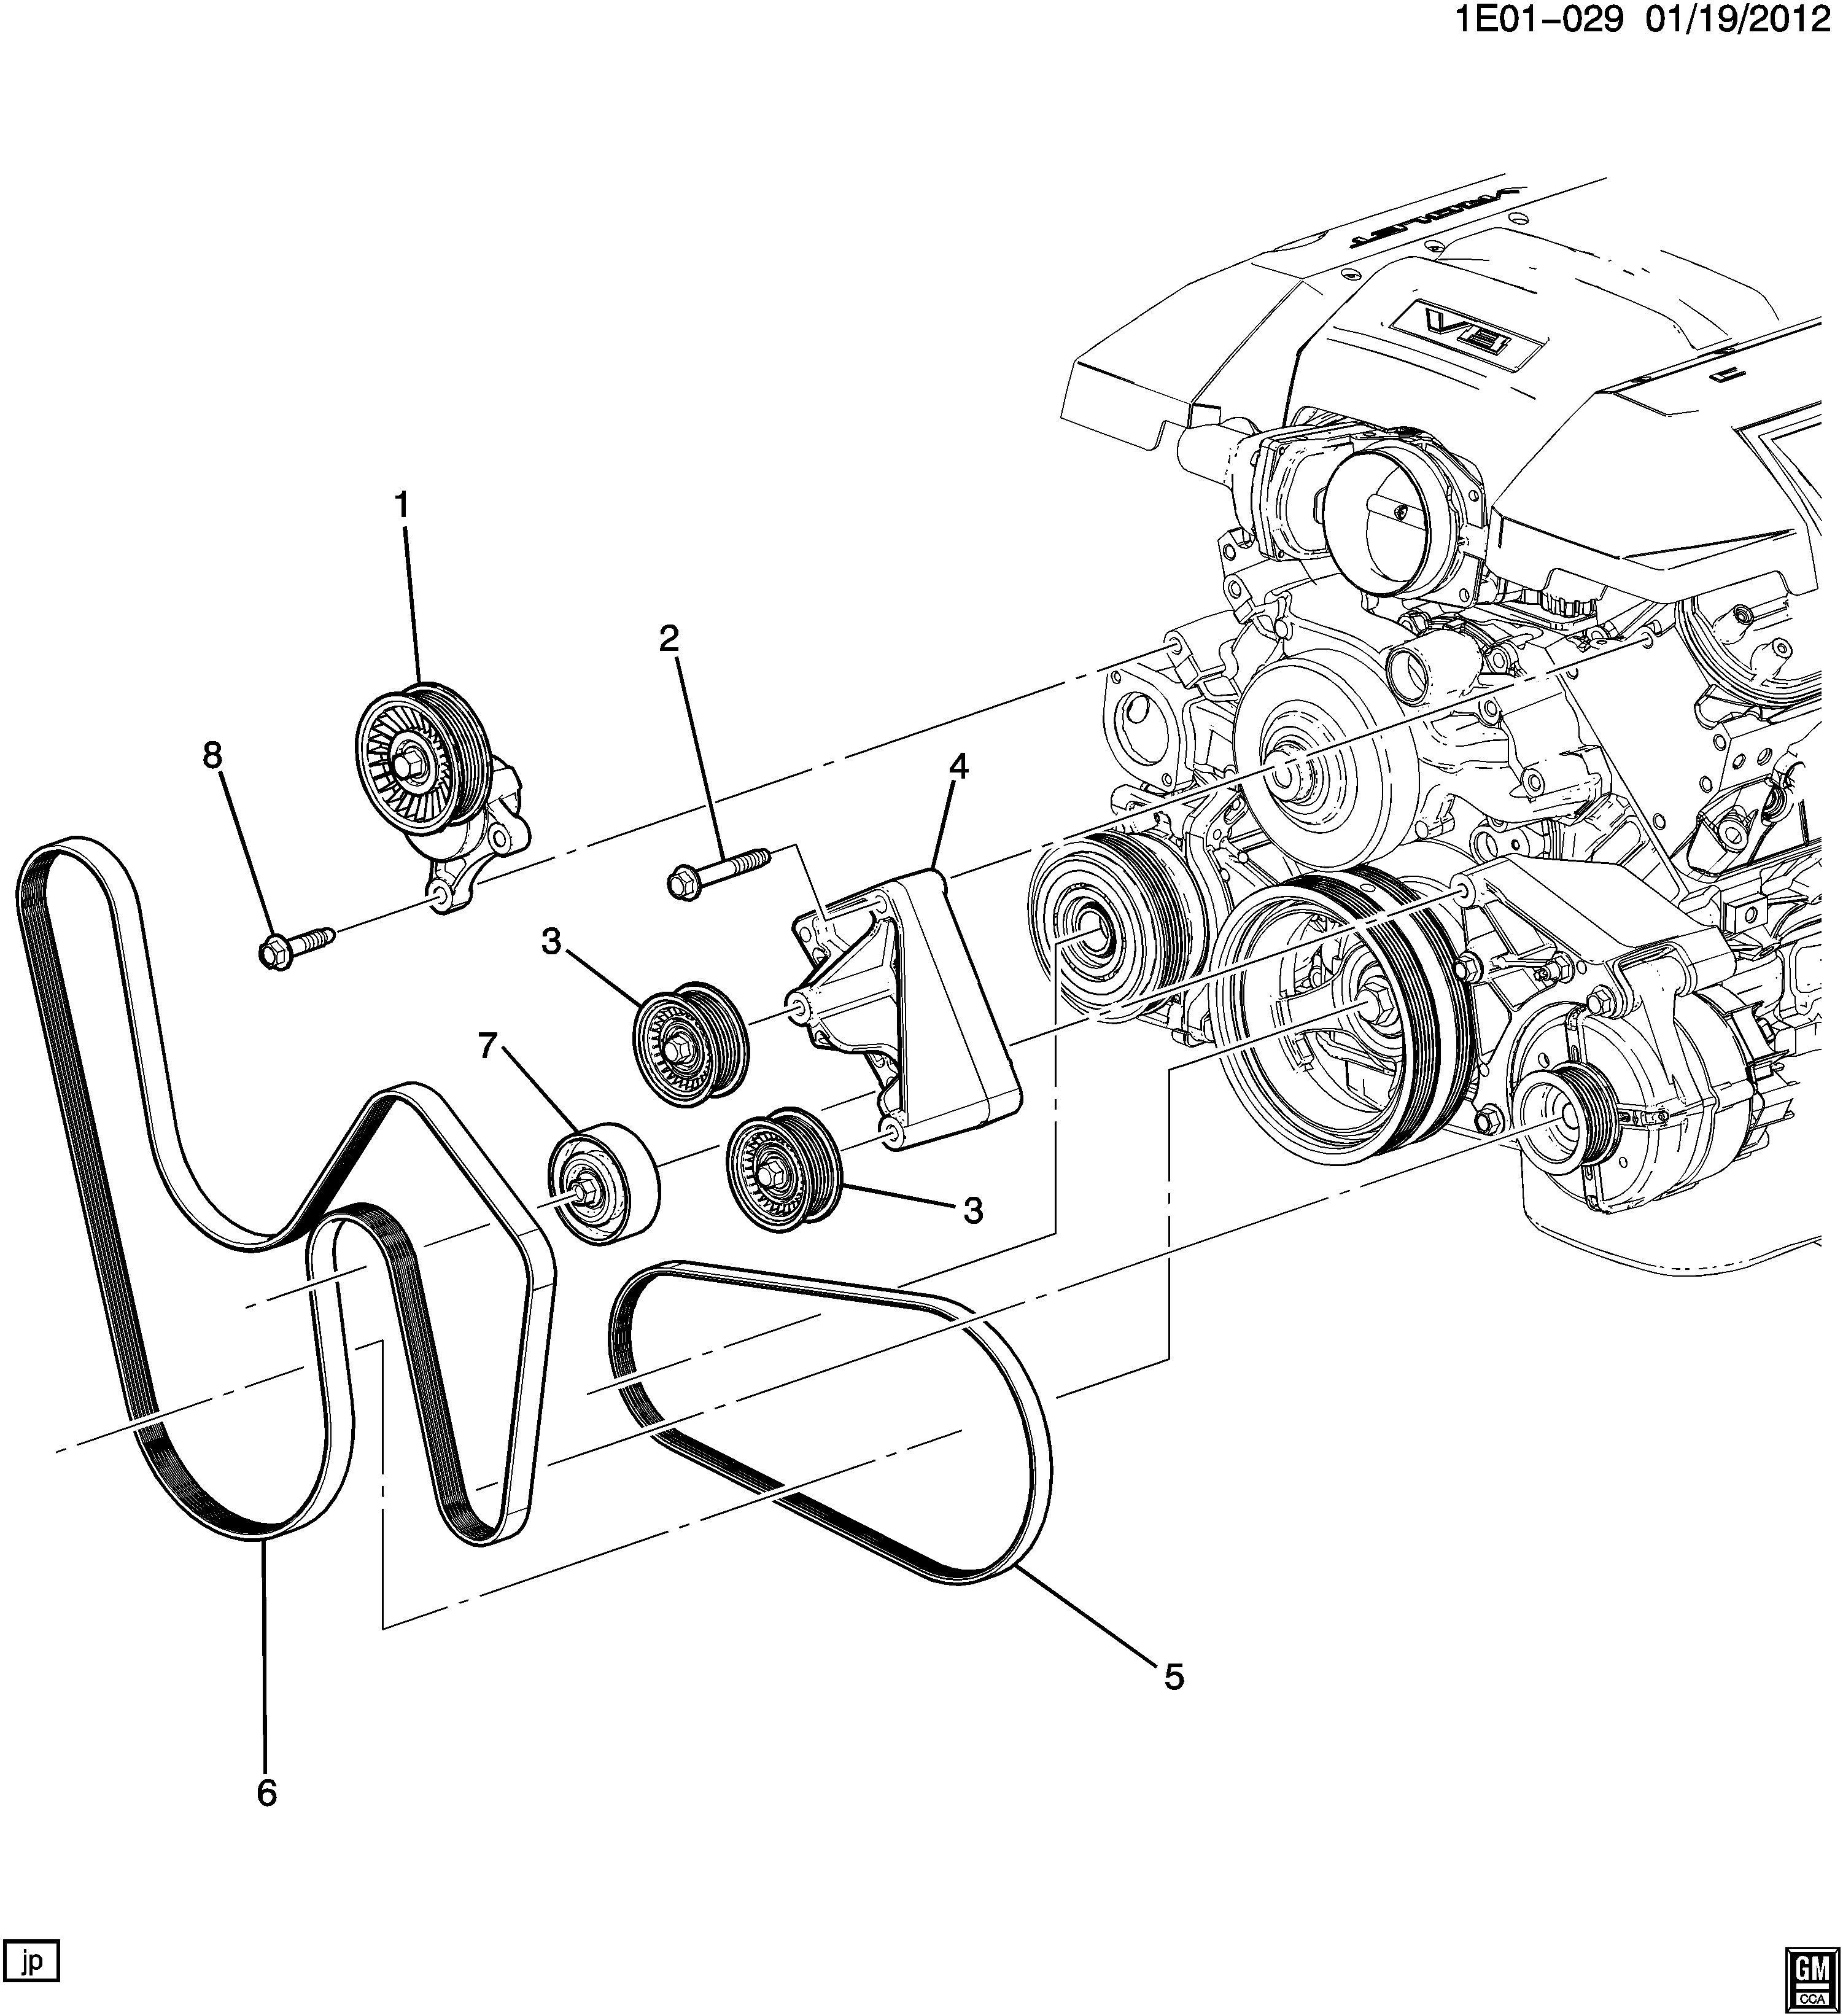 2014 Chevrolet Camaro SS (2SS) 2DR Belt kit. Drive. Belt